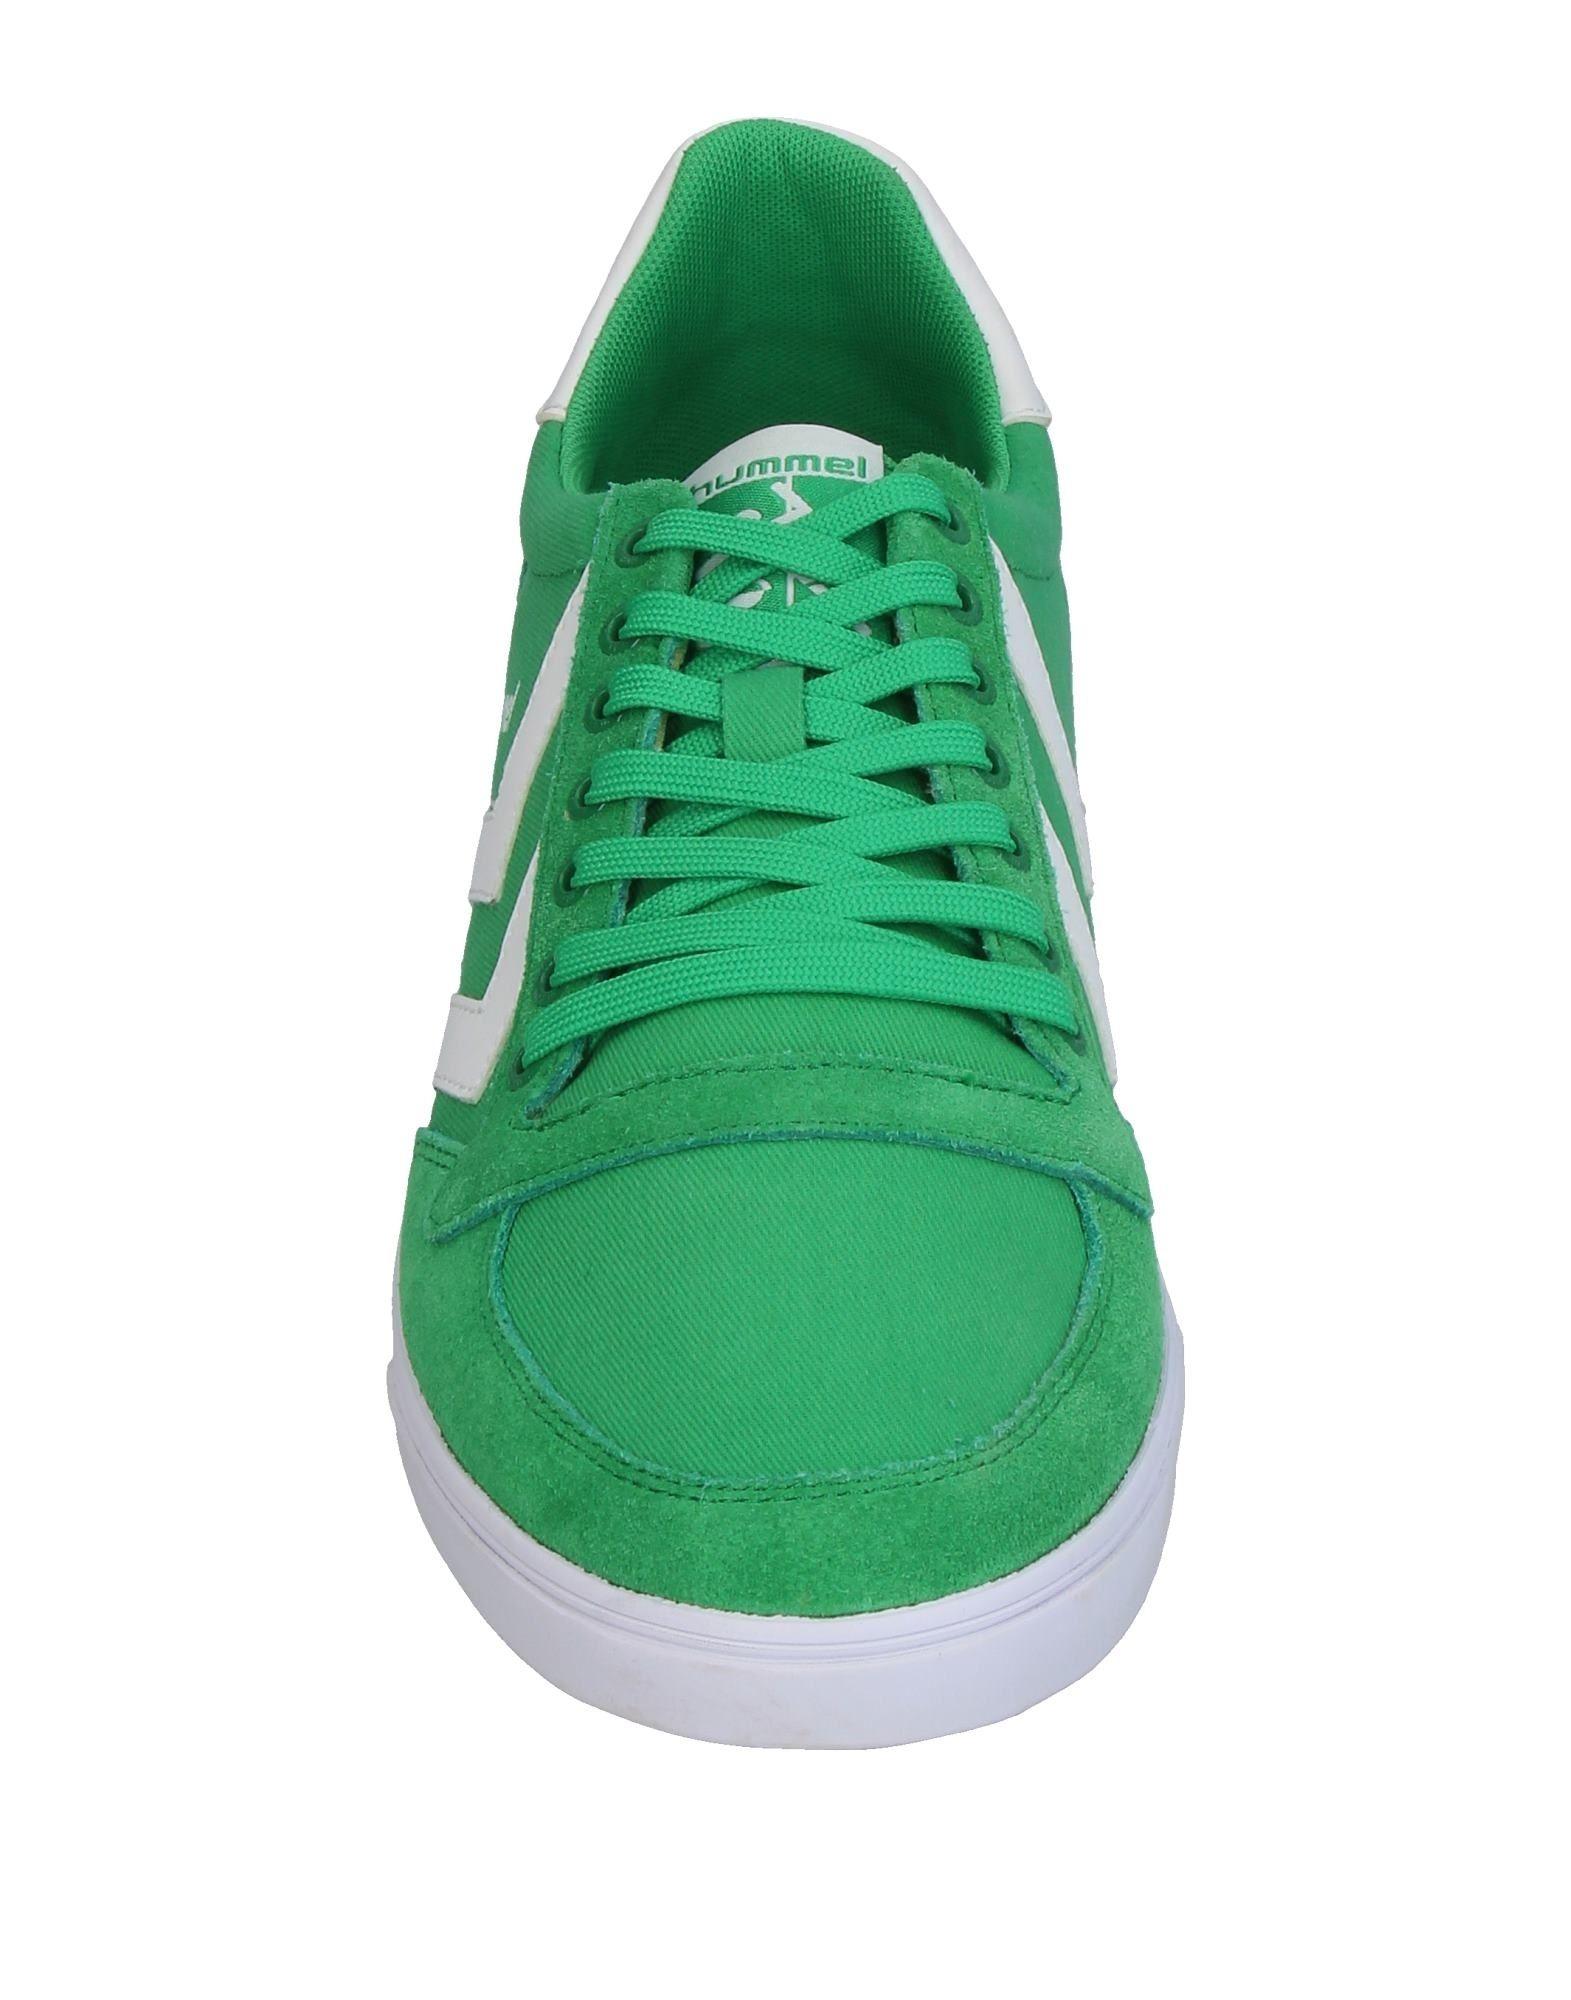 Sneakers Hummel Homme - Sneakers Hummel sur